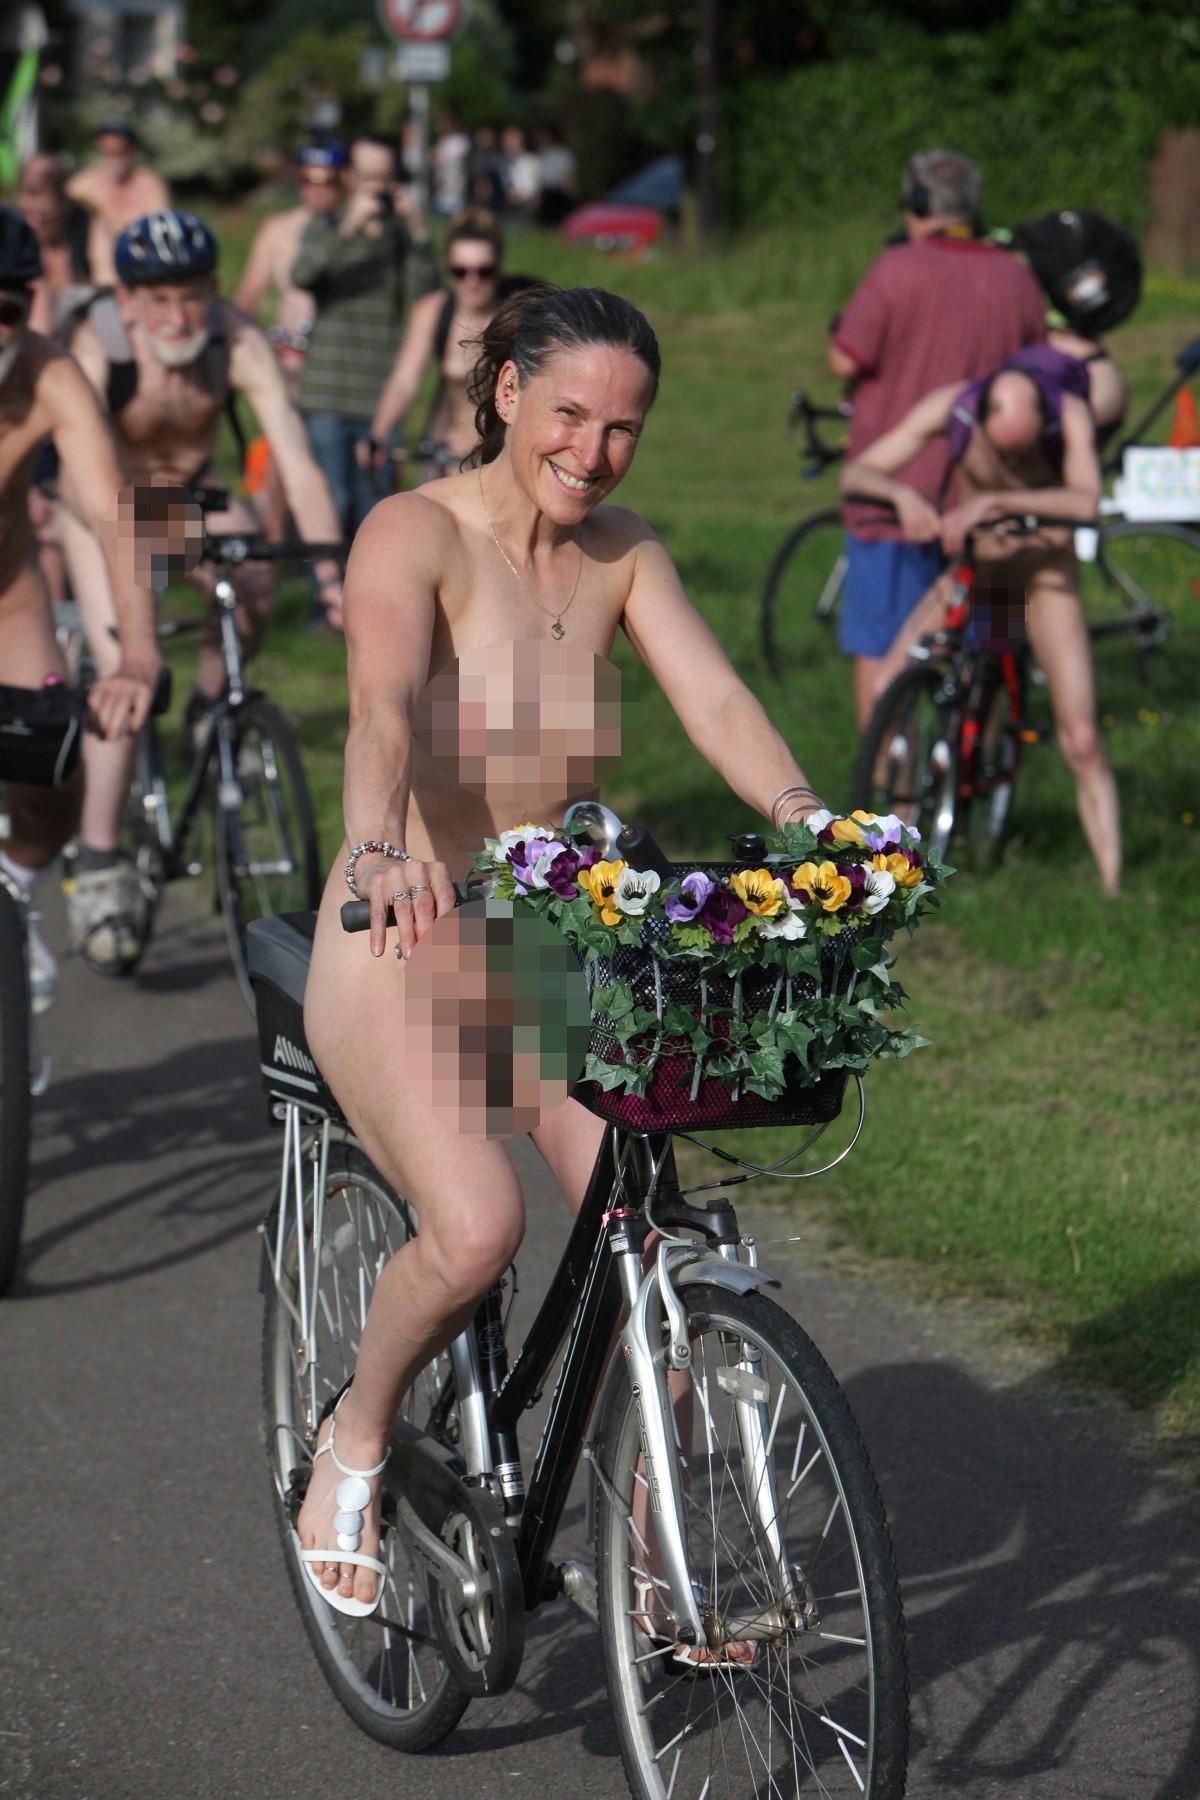 bike nede naked Naked Bike Ride